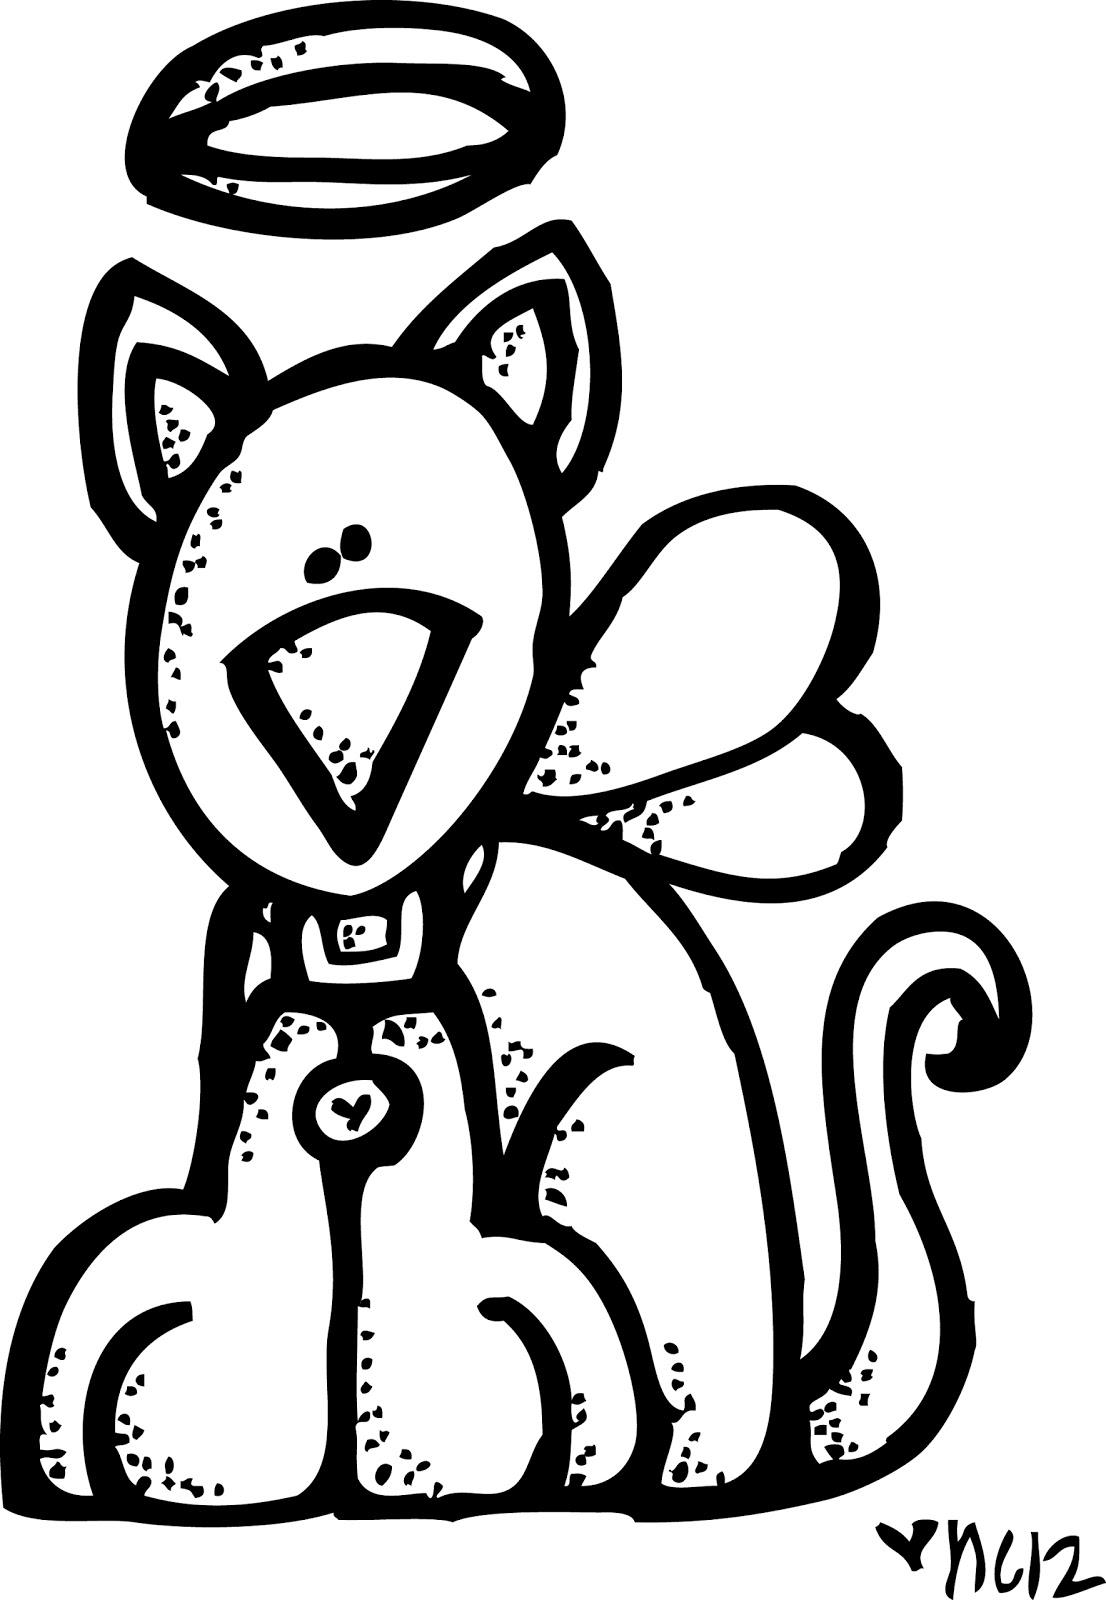 MelonHeadz: Human Family (pet sympathy) Request